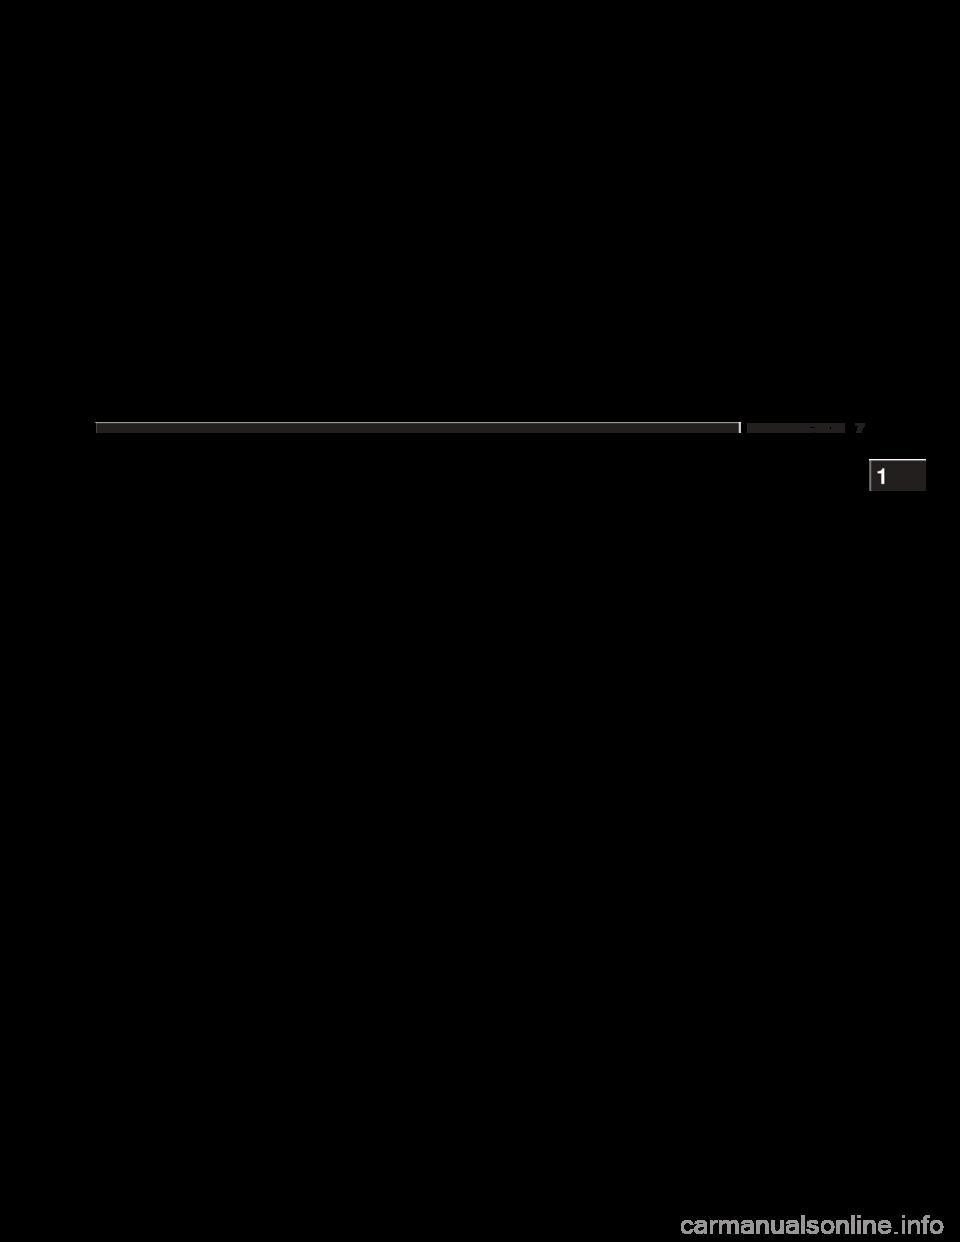 Dodge durango 2014 3g owners manual publicscrutiny Choice Image